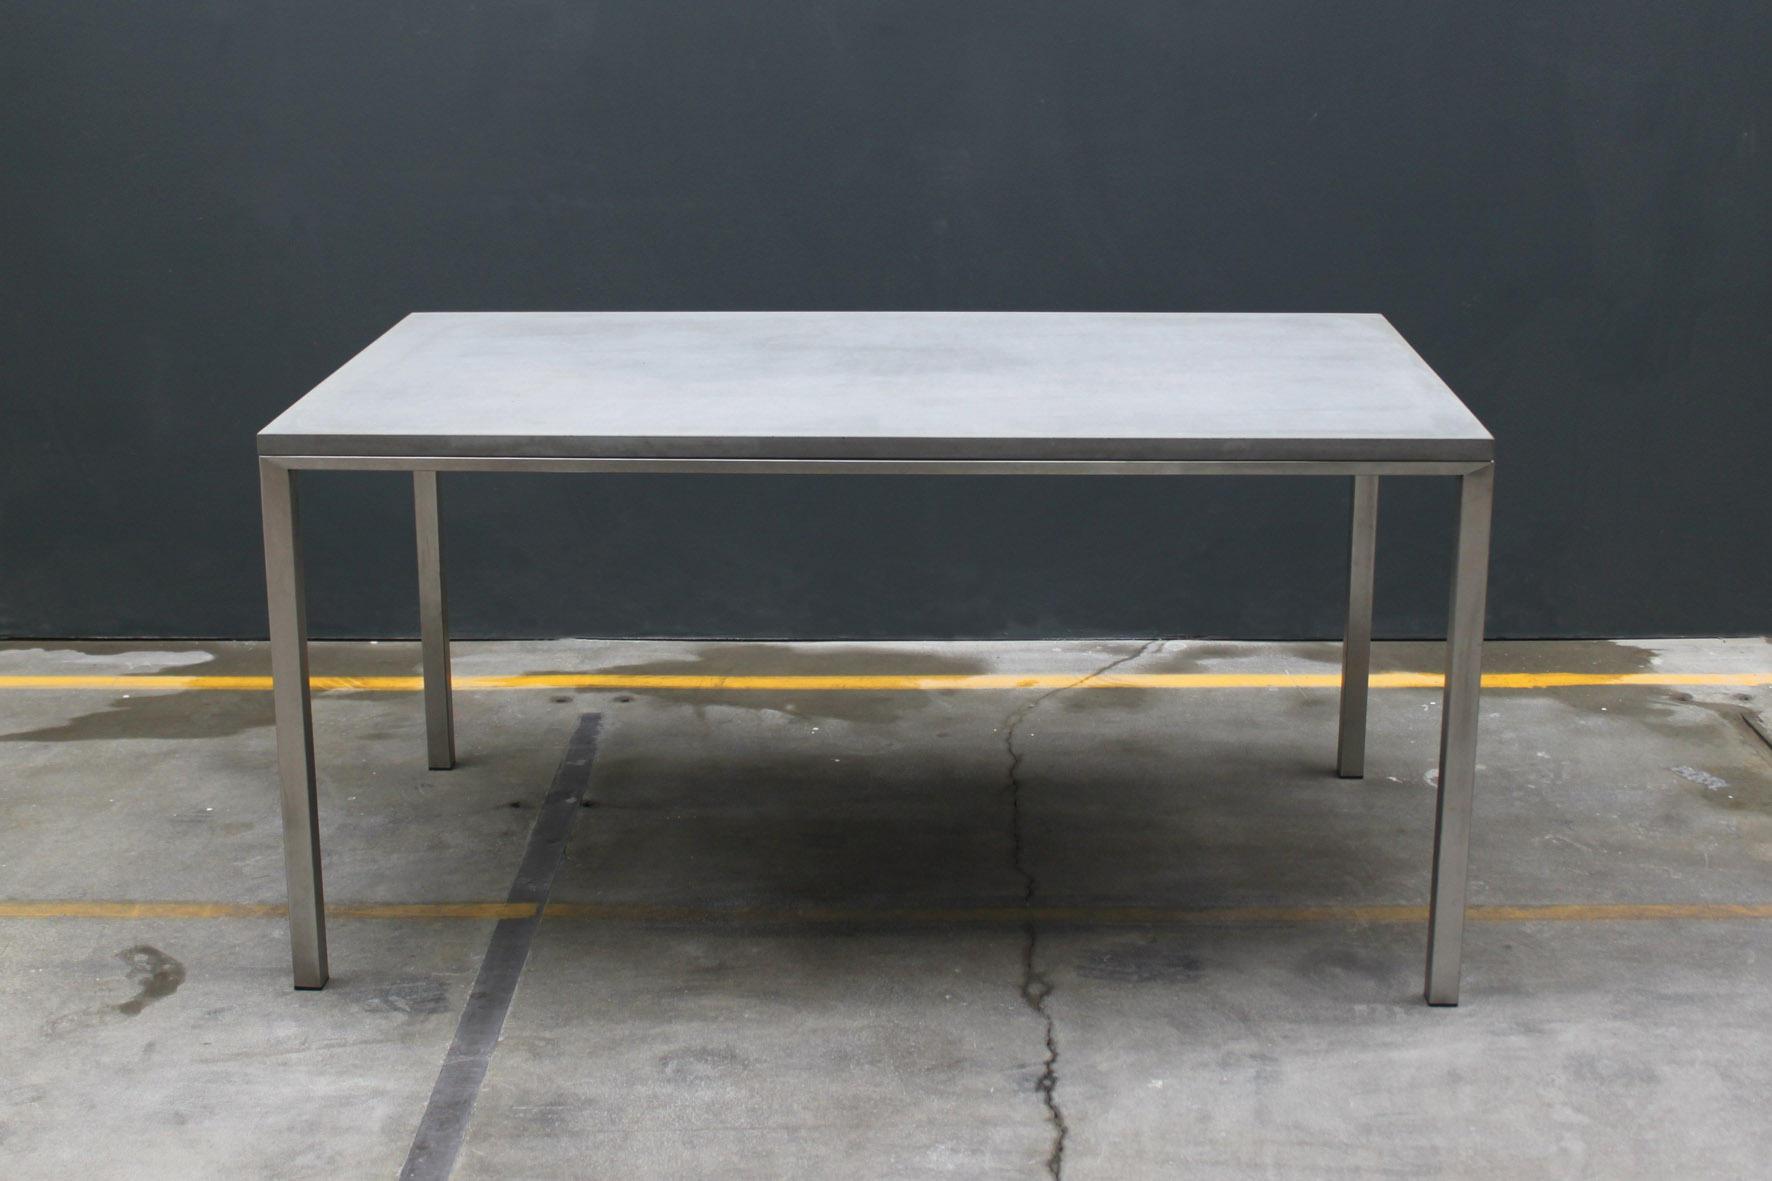 dinner table dining tables from concrete home design. Black Bedroom Furniture Sets. Home Design Ideas